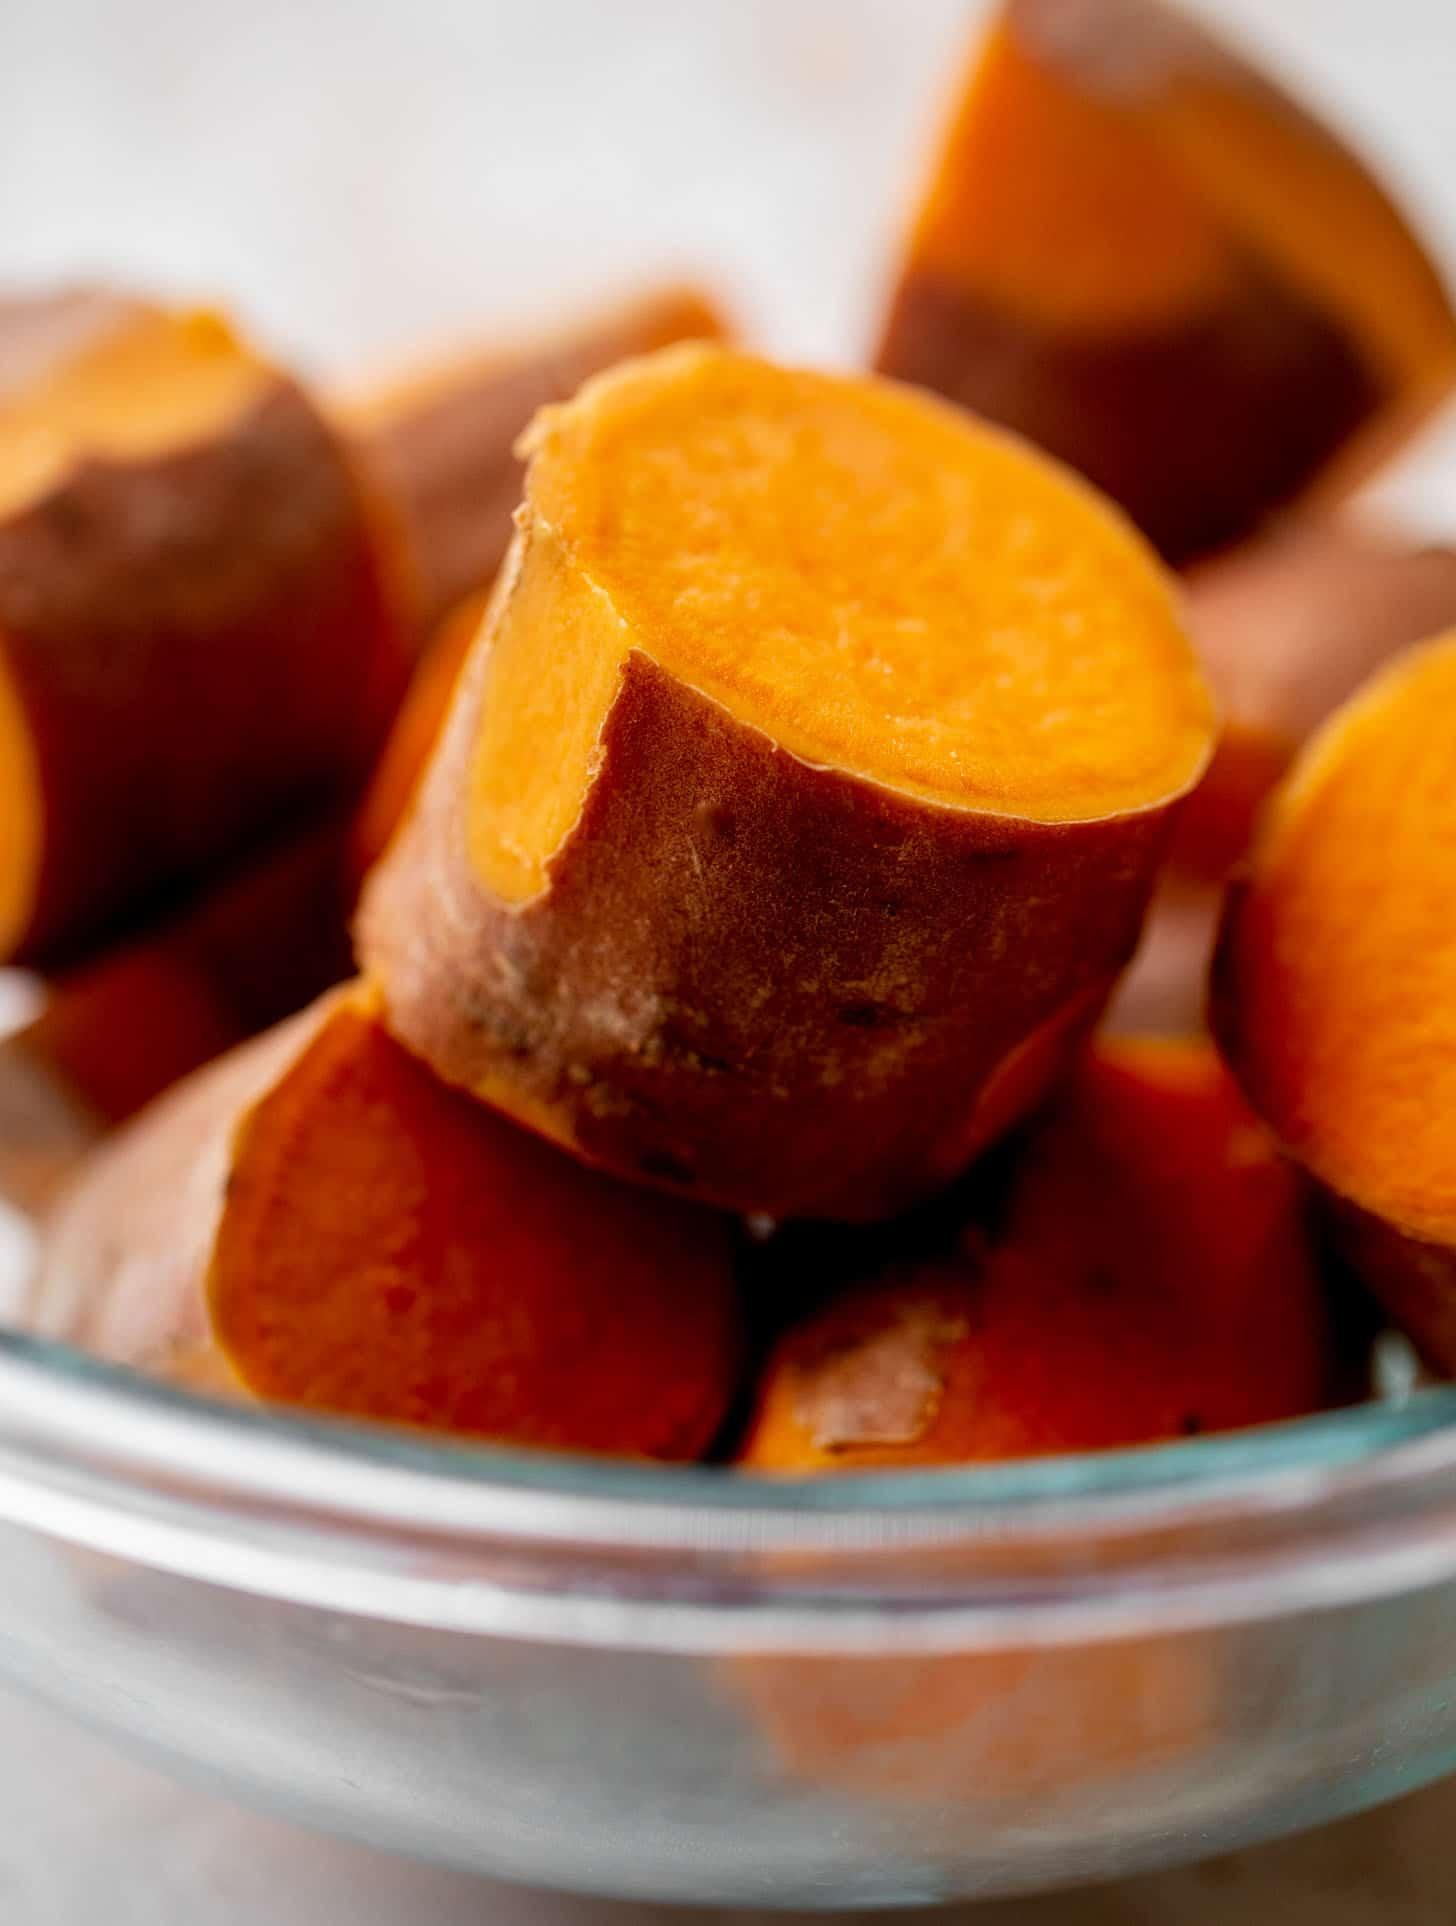 par boiled sweet potatoes